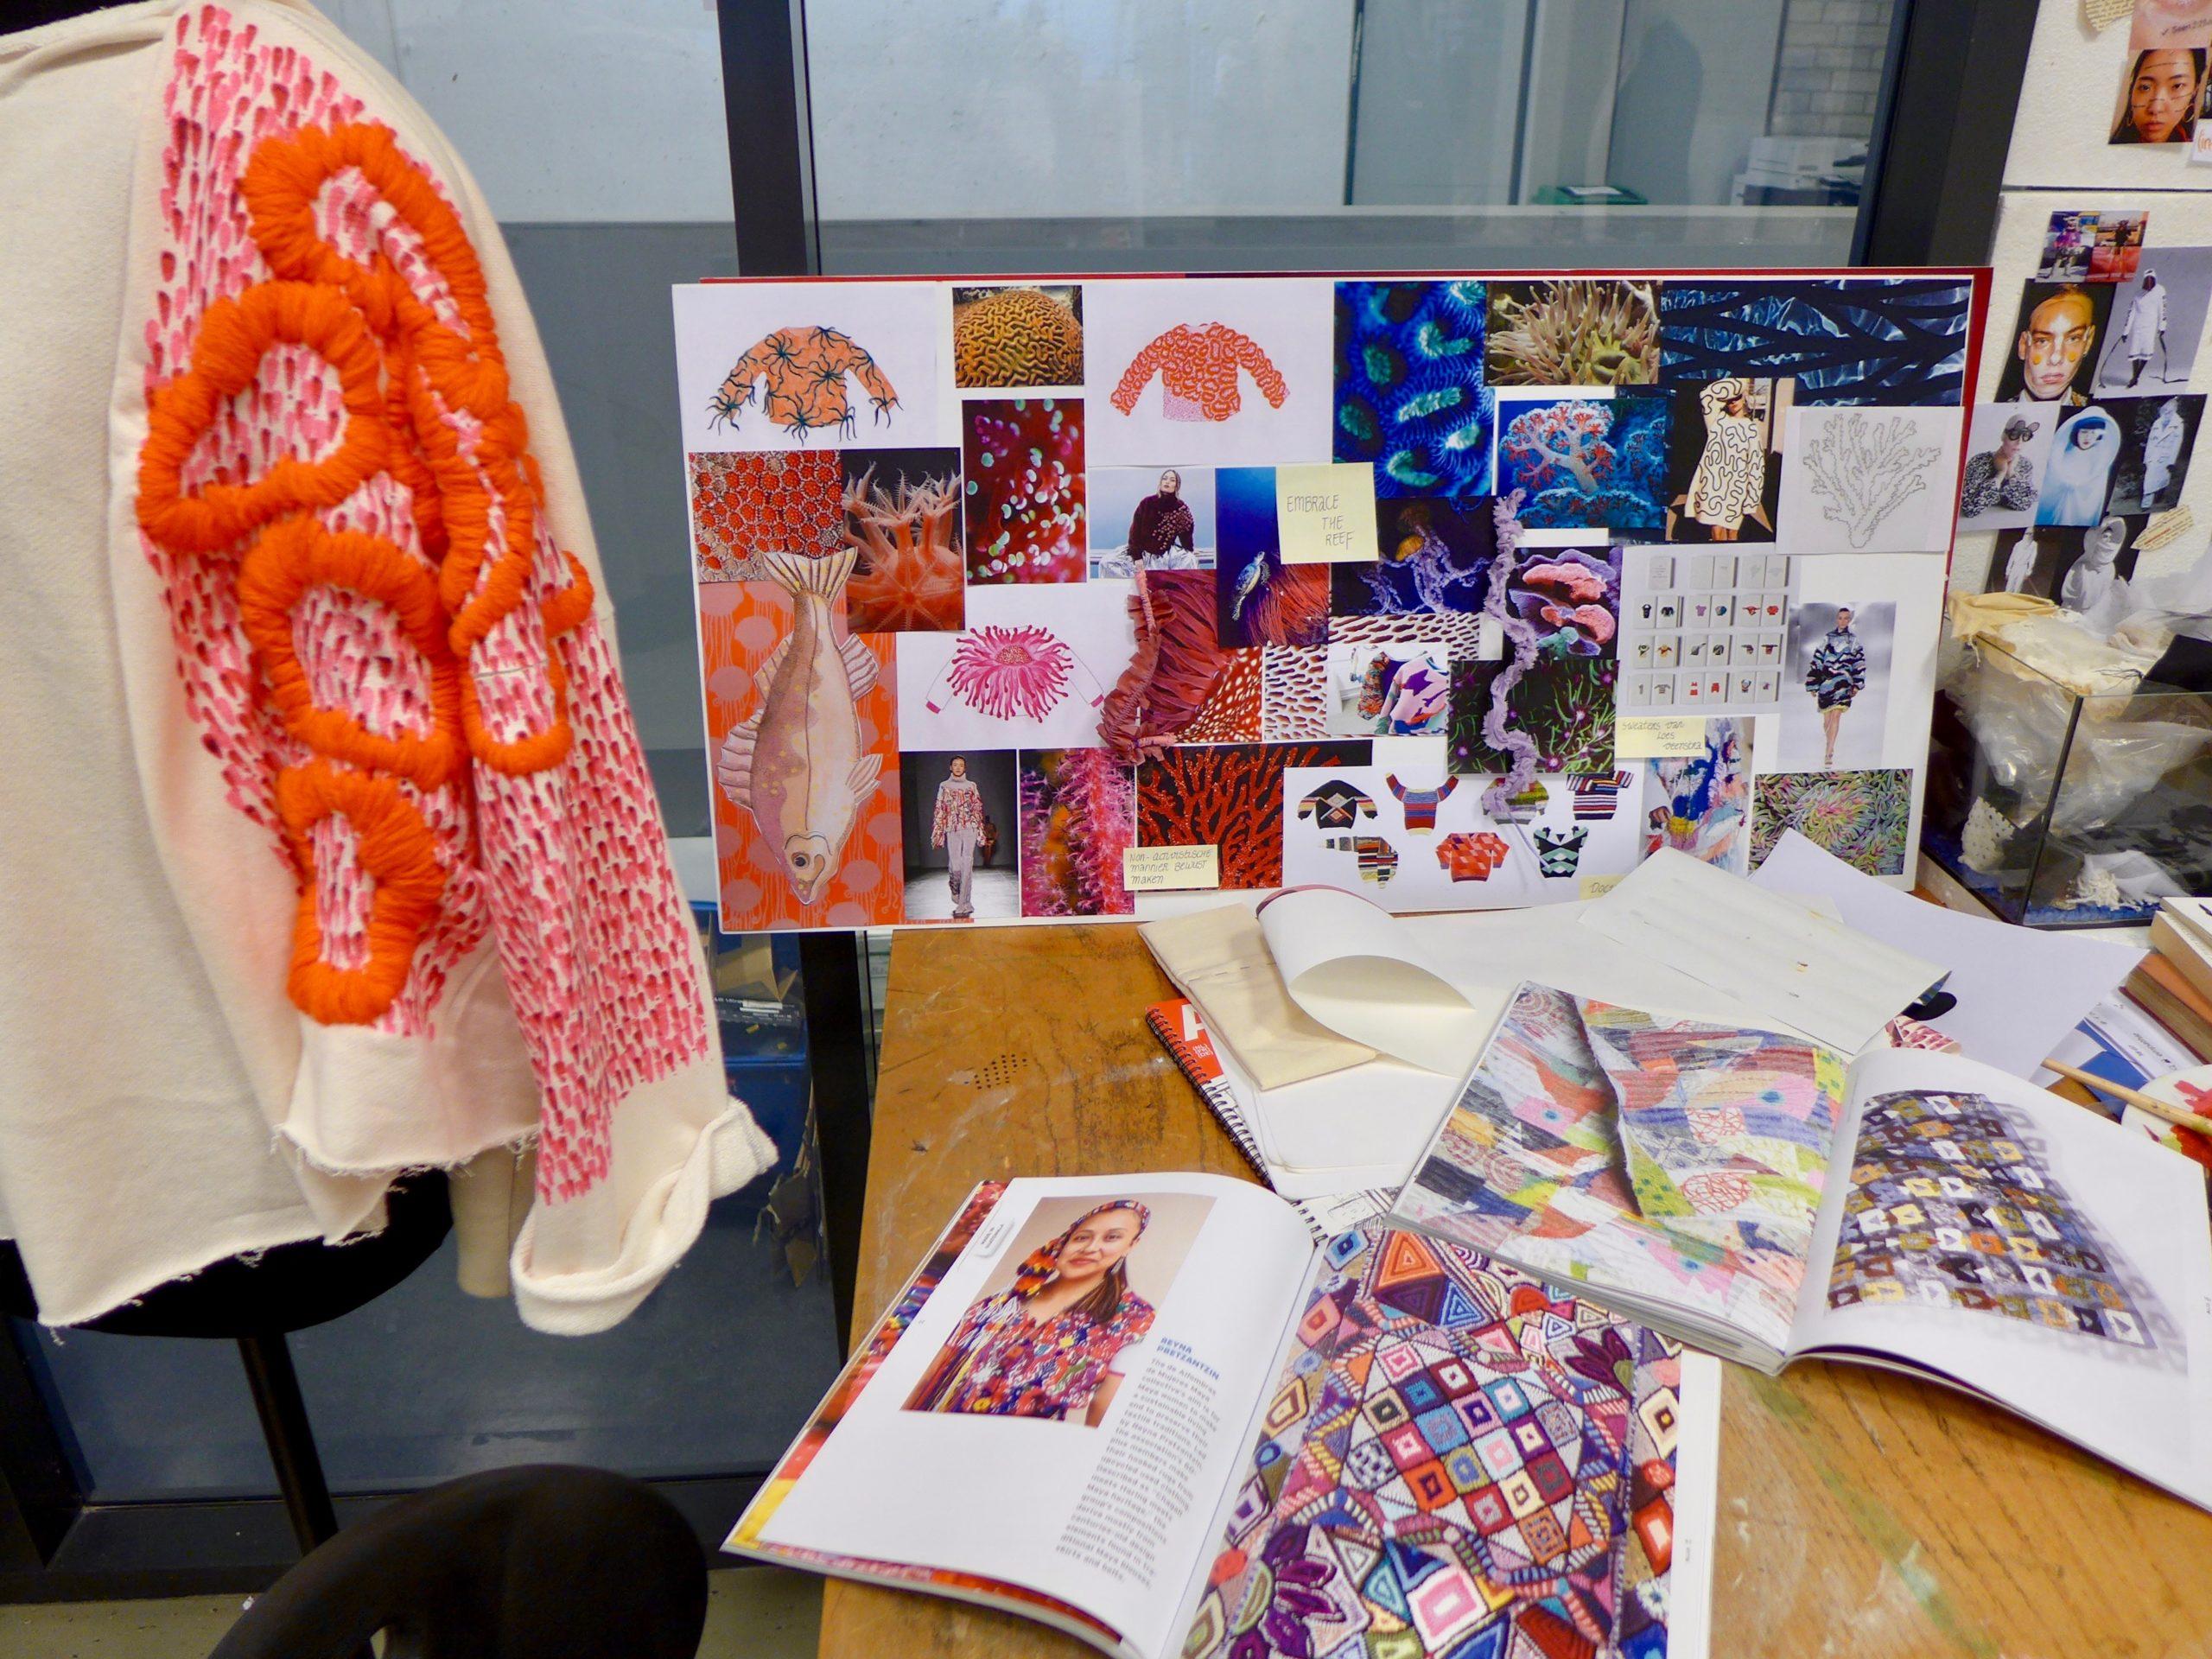 GEANNULEERD / Kunstliefde / HKU Fashion Design